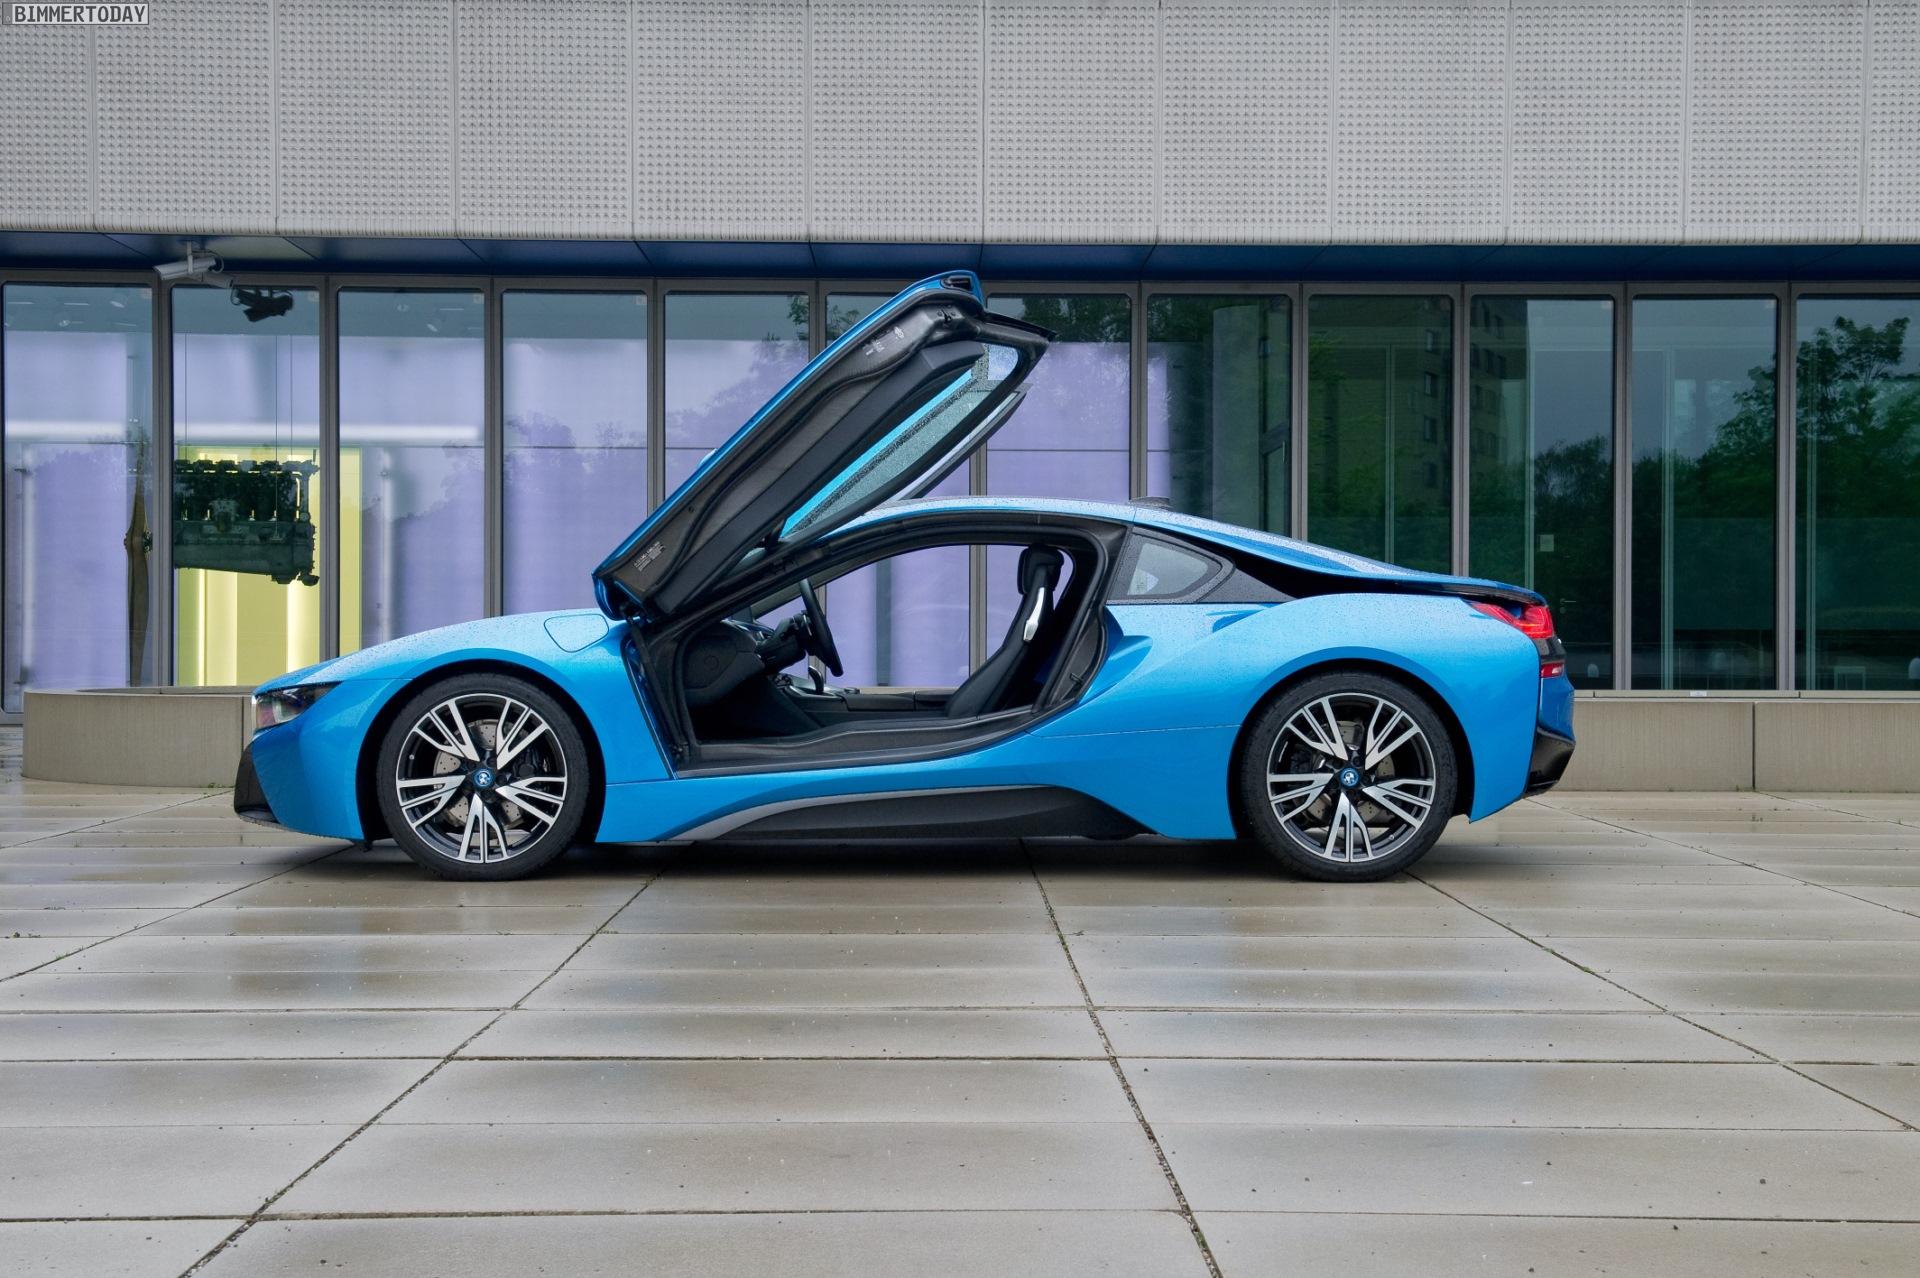 BMW i8 Protonic Blue Wimmer Fotografie 07